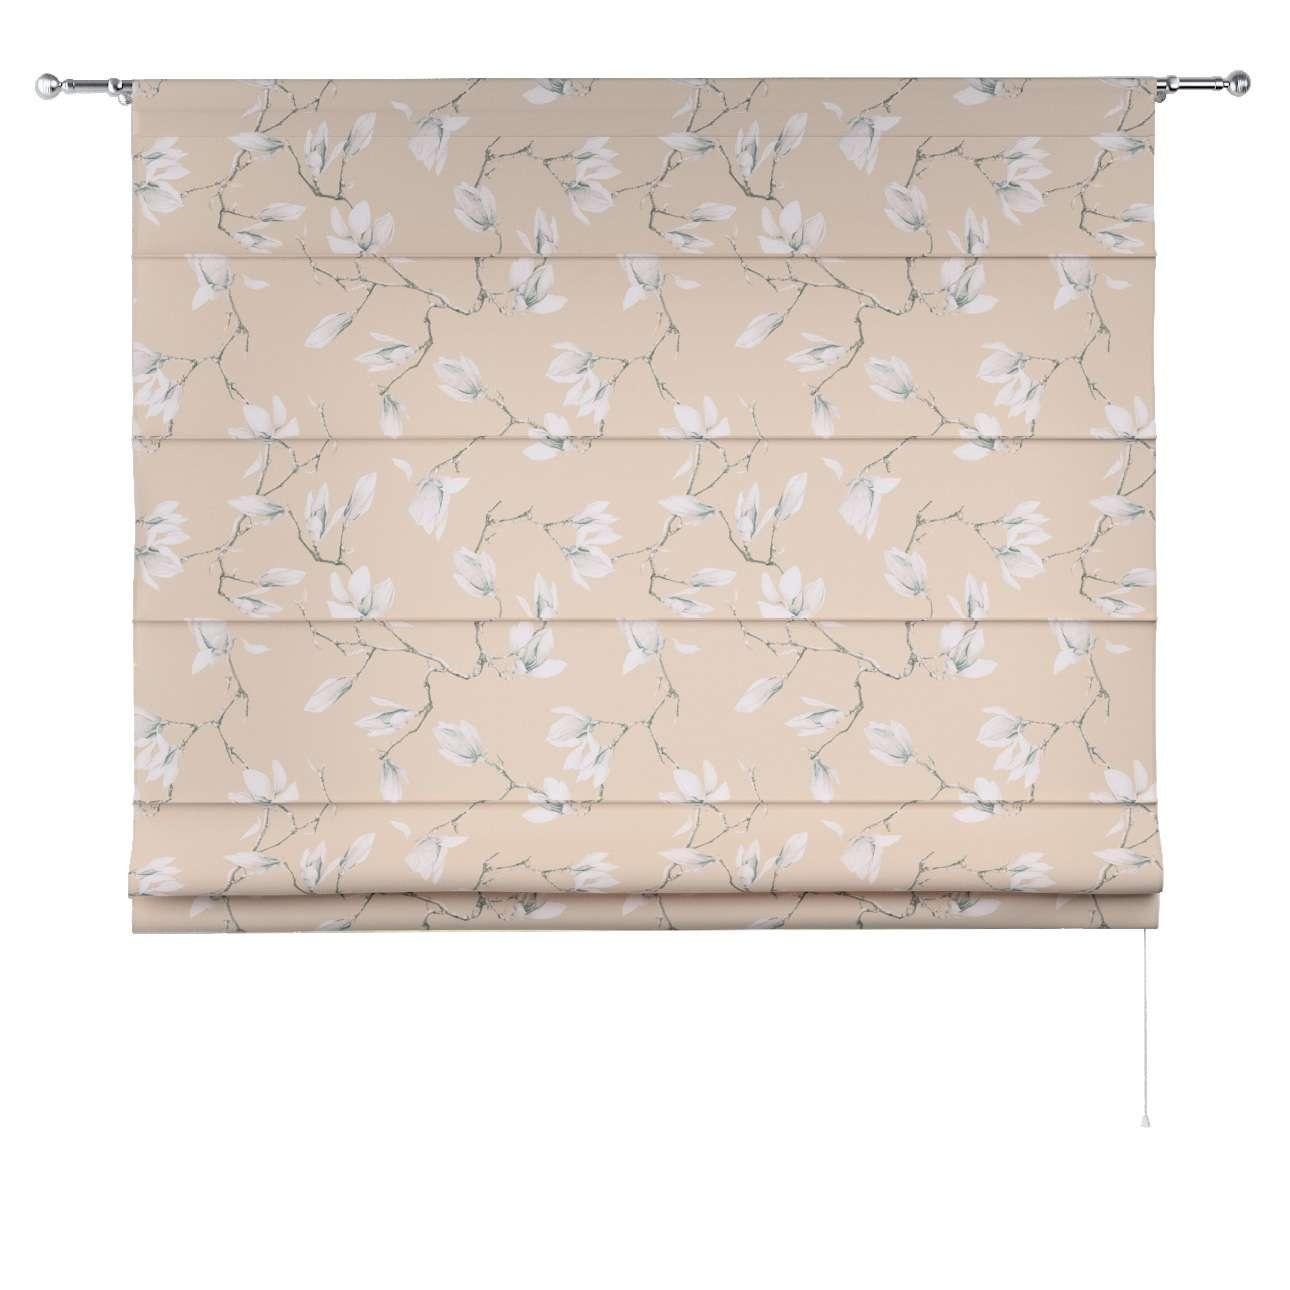 Rímska roleta Torino V kolekcii Flowers, tkanina: 311-12